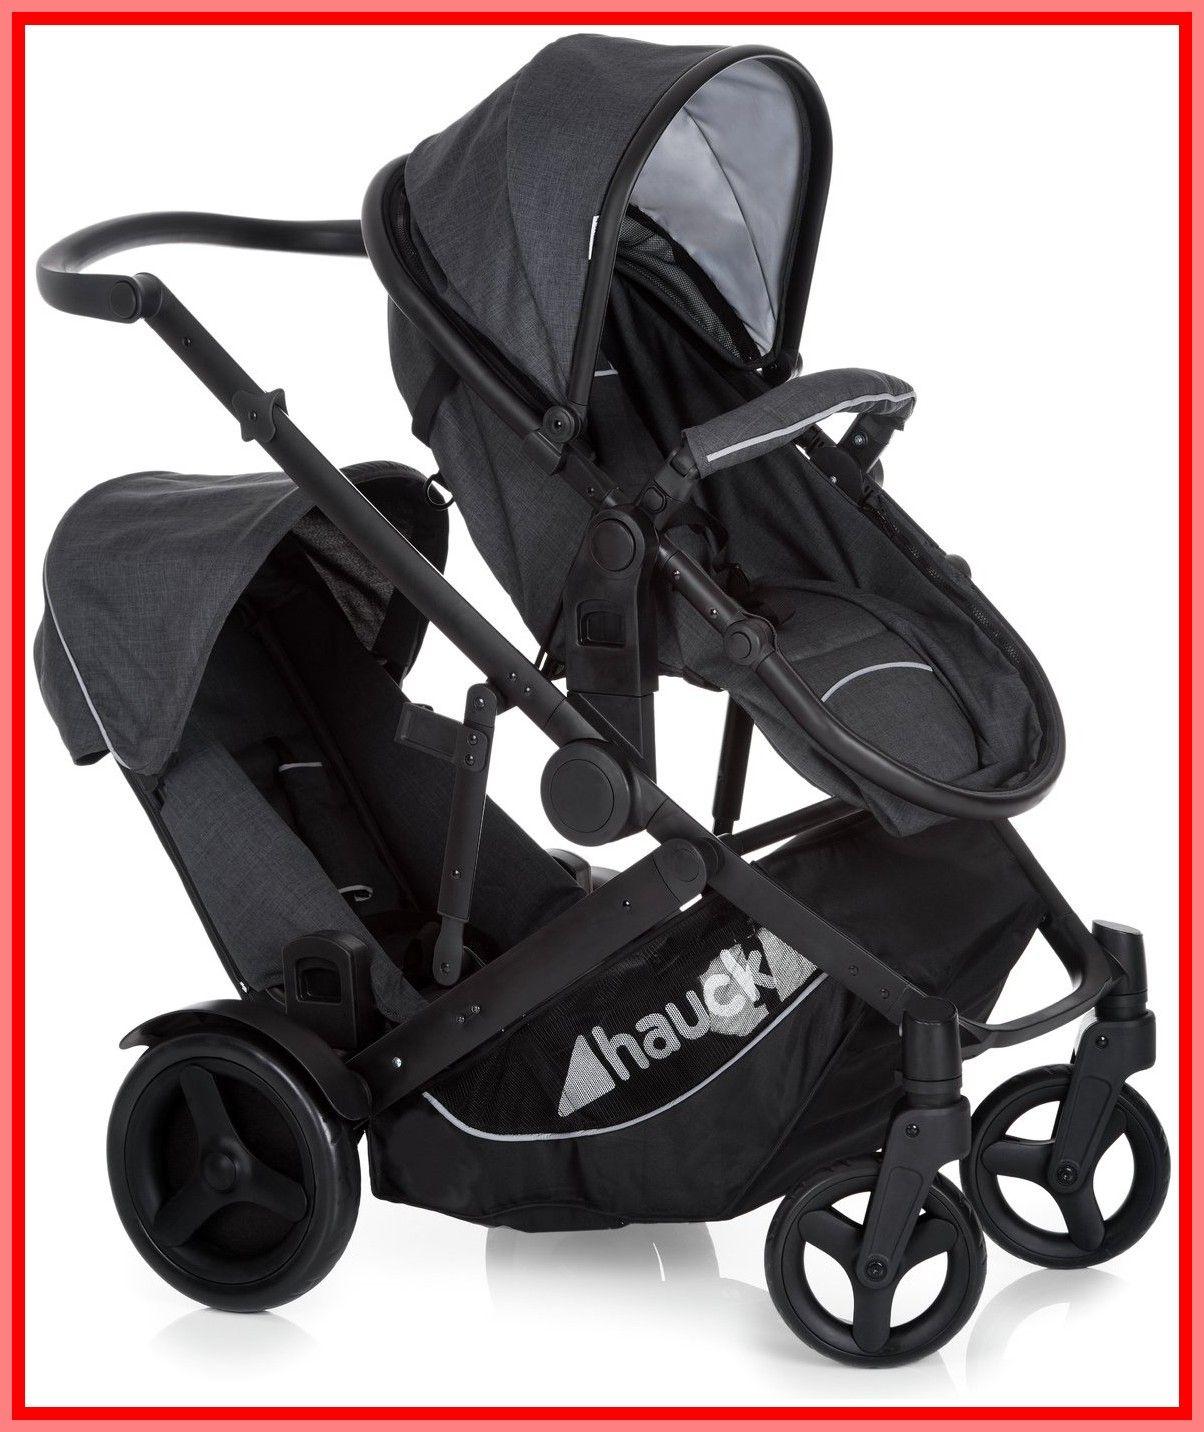 Stroller For Sale Norwich - Stroller